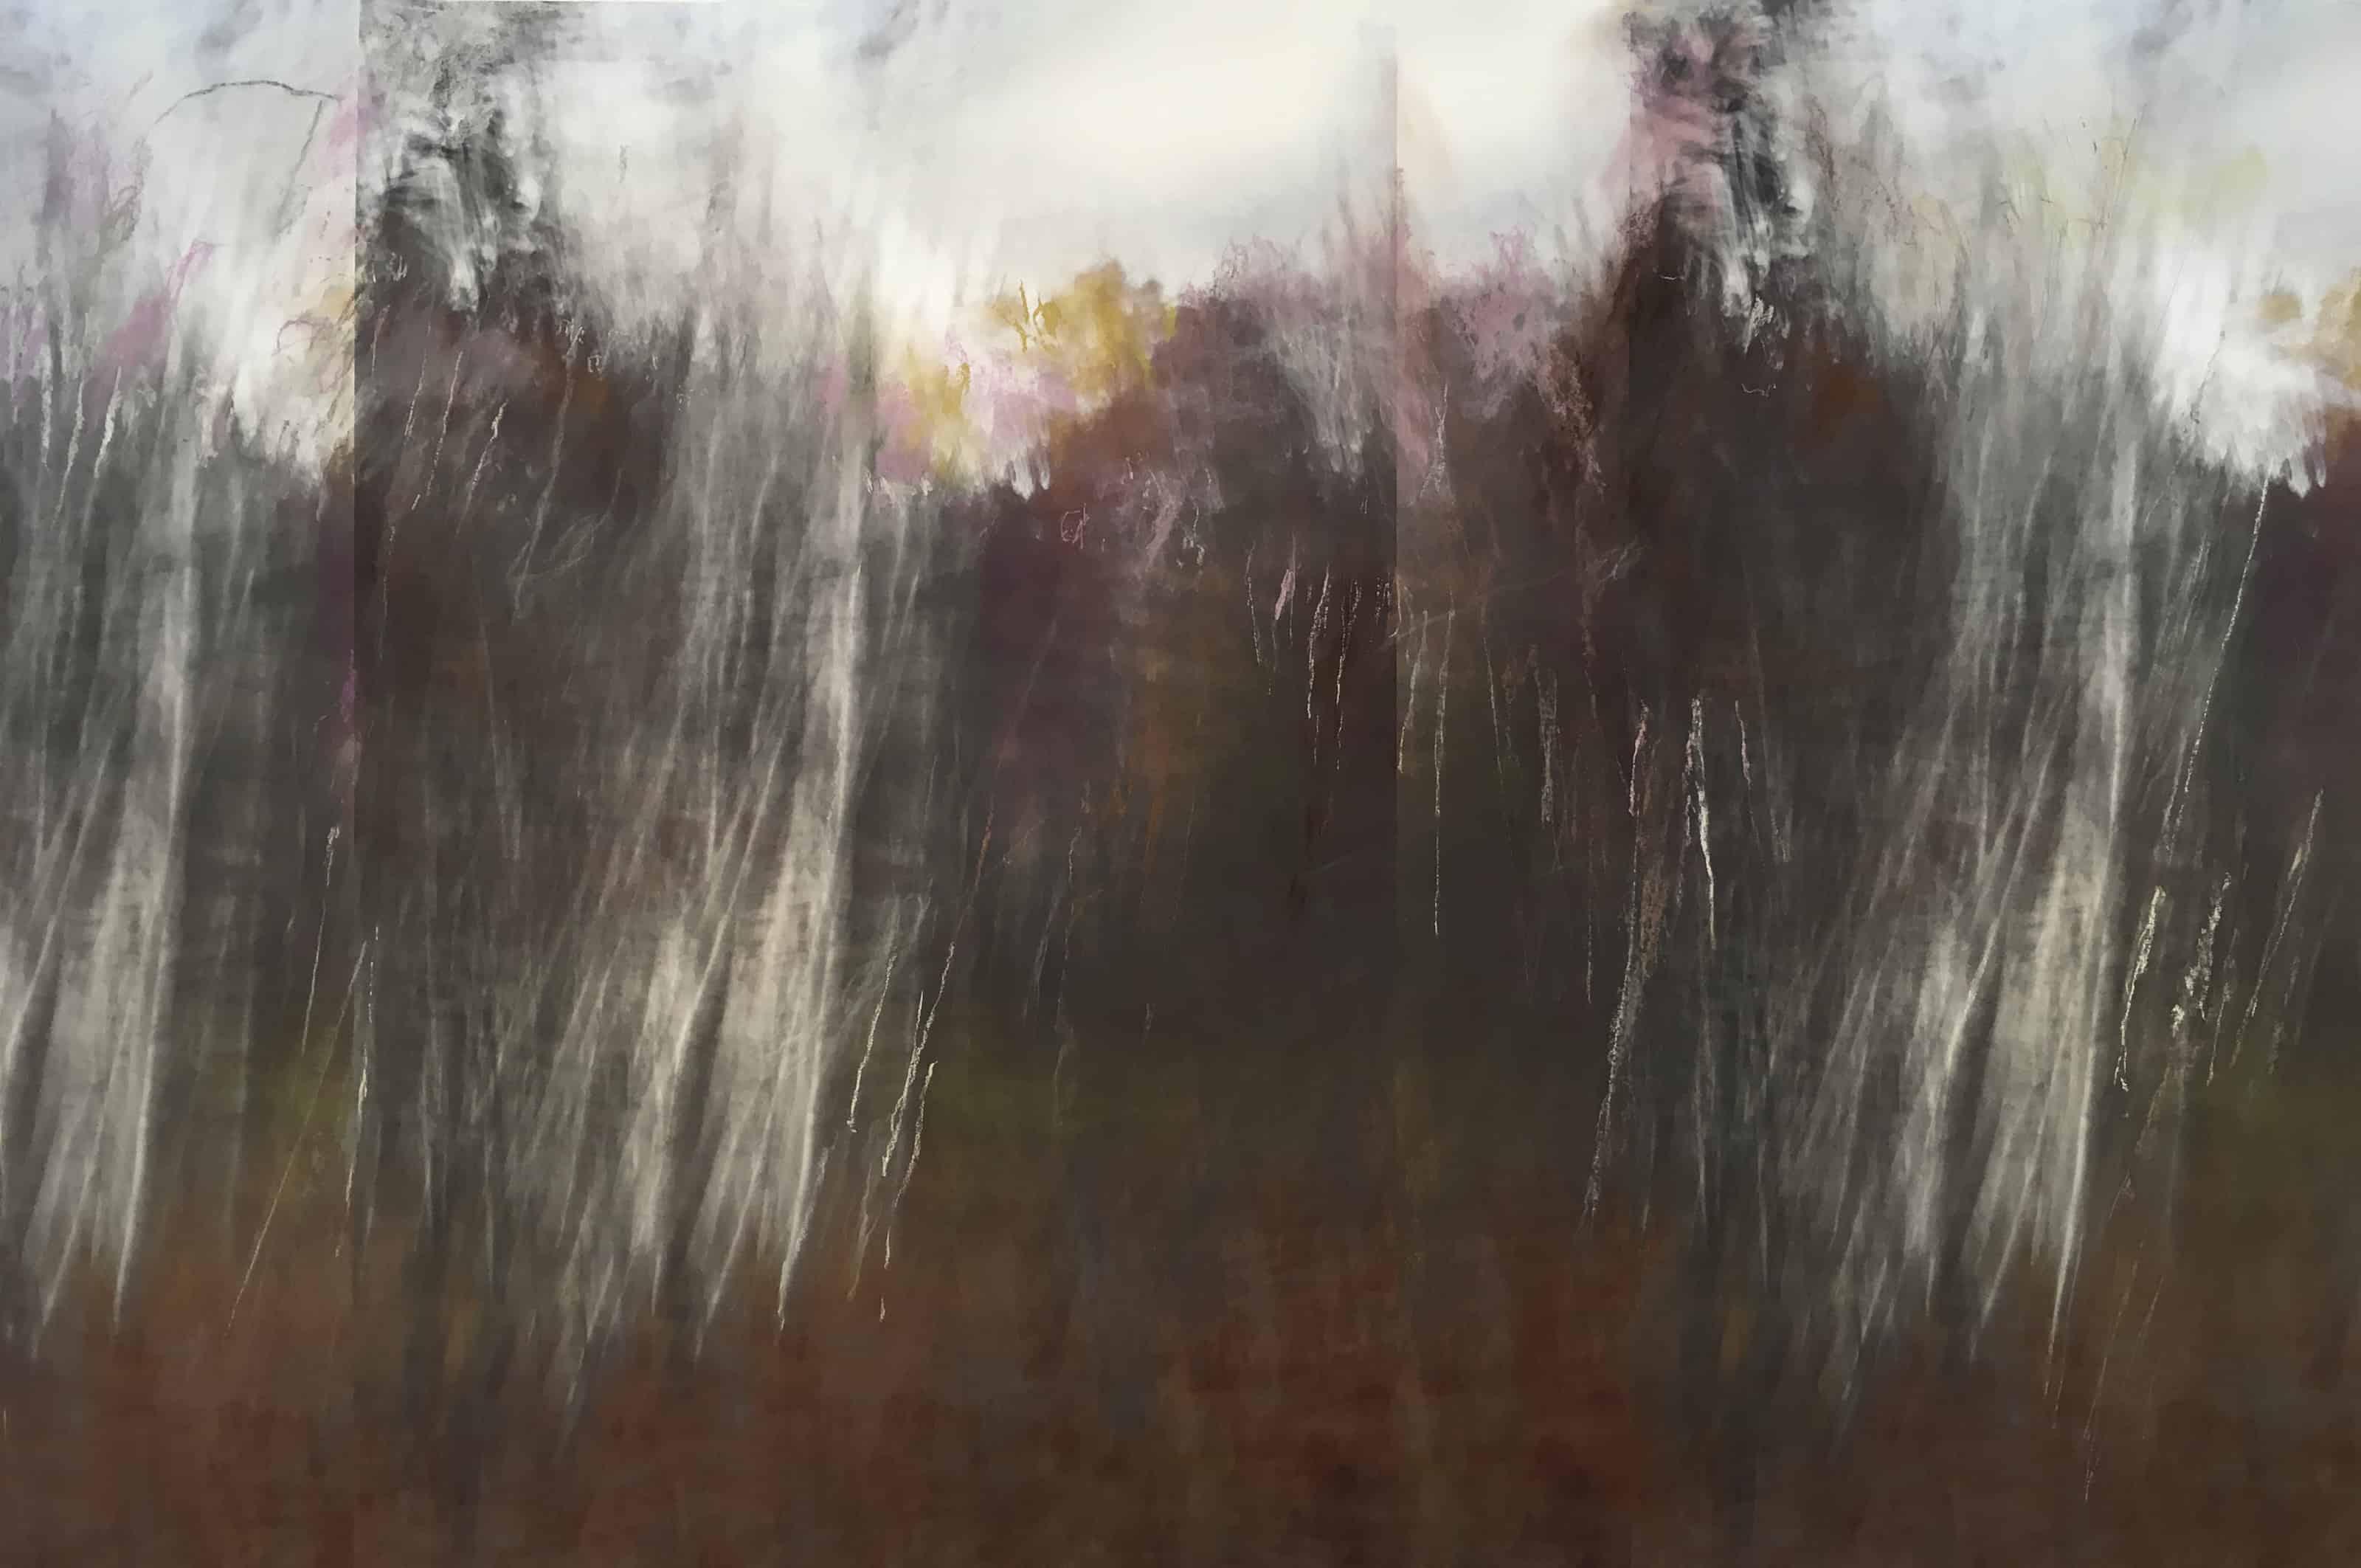 John Clark's abstractions, courtesy of the Sohn Gallery in Lenox